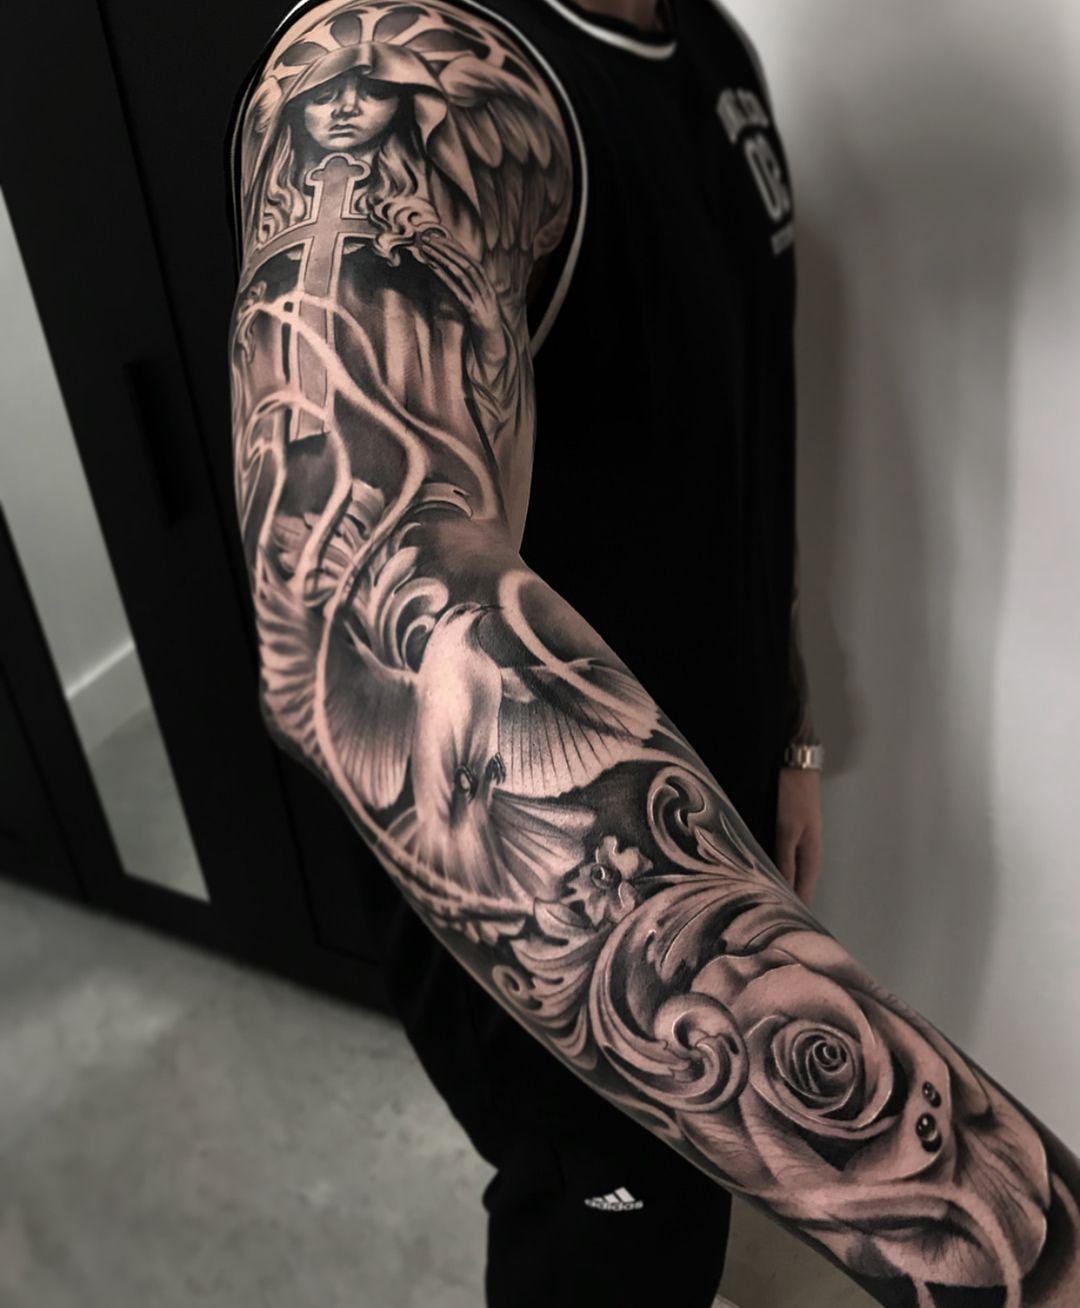 B G Tattoo Artwork Artist I Tattoos For Guys Tattoo Sleeve Men Sleeve Tattoos